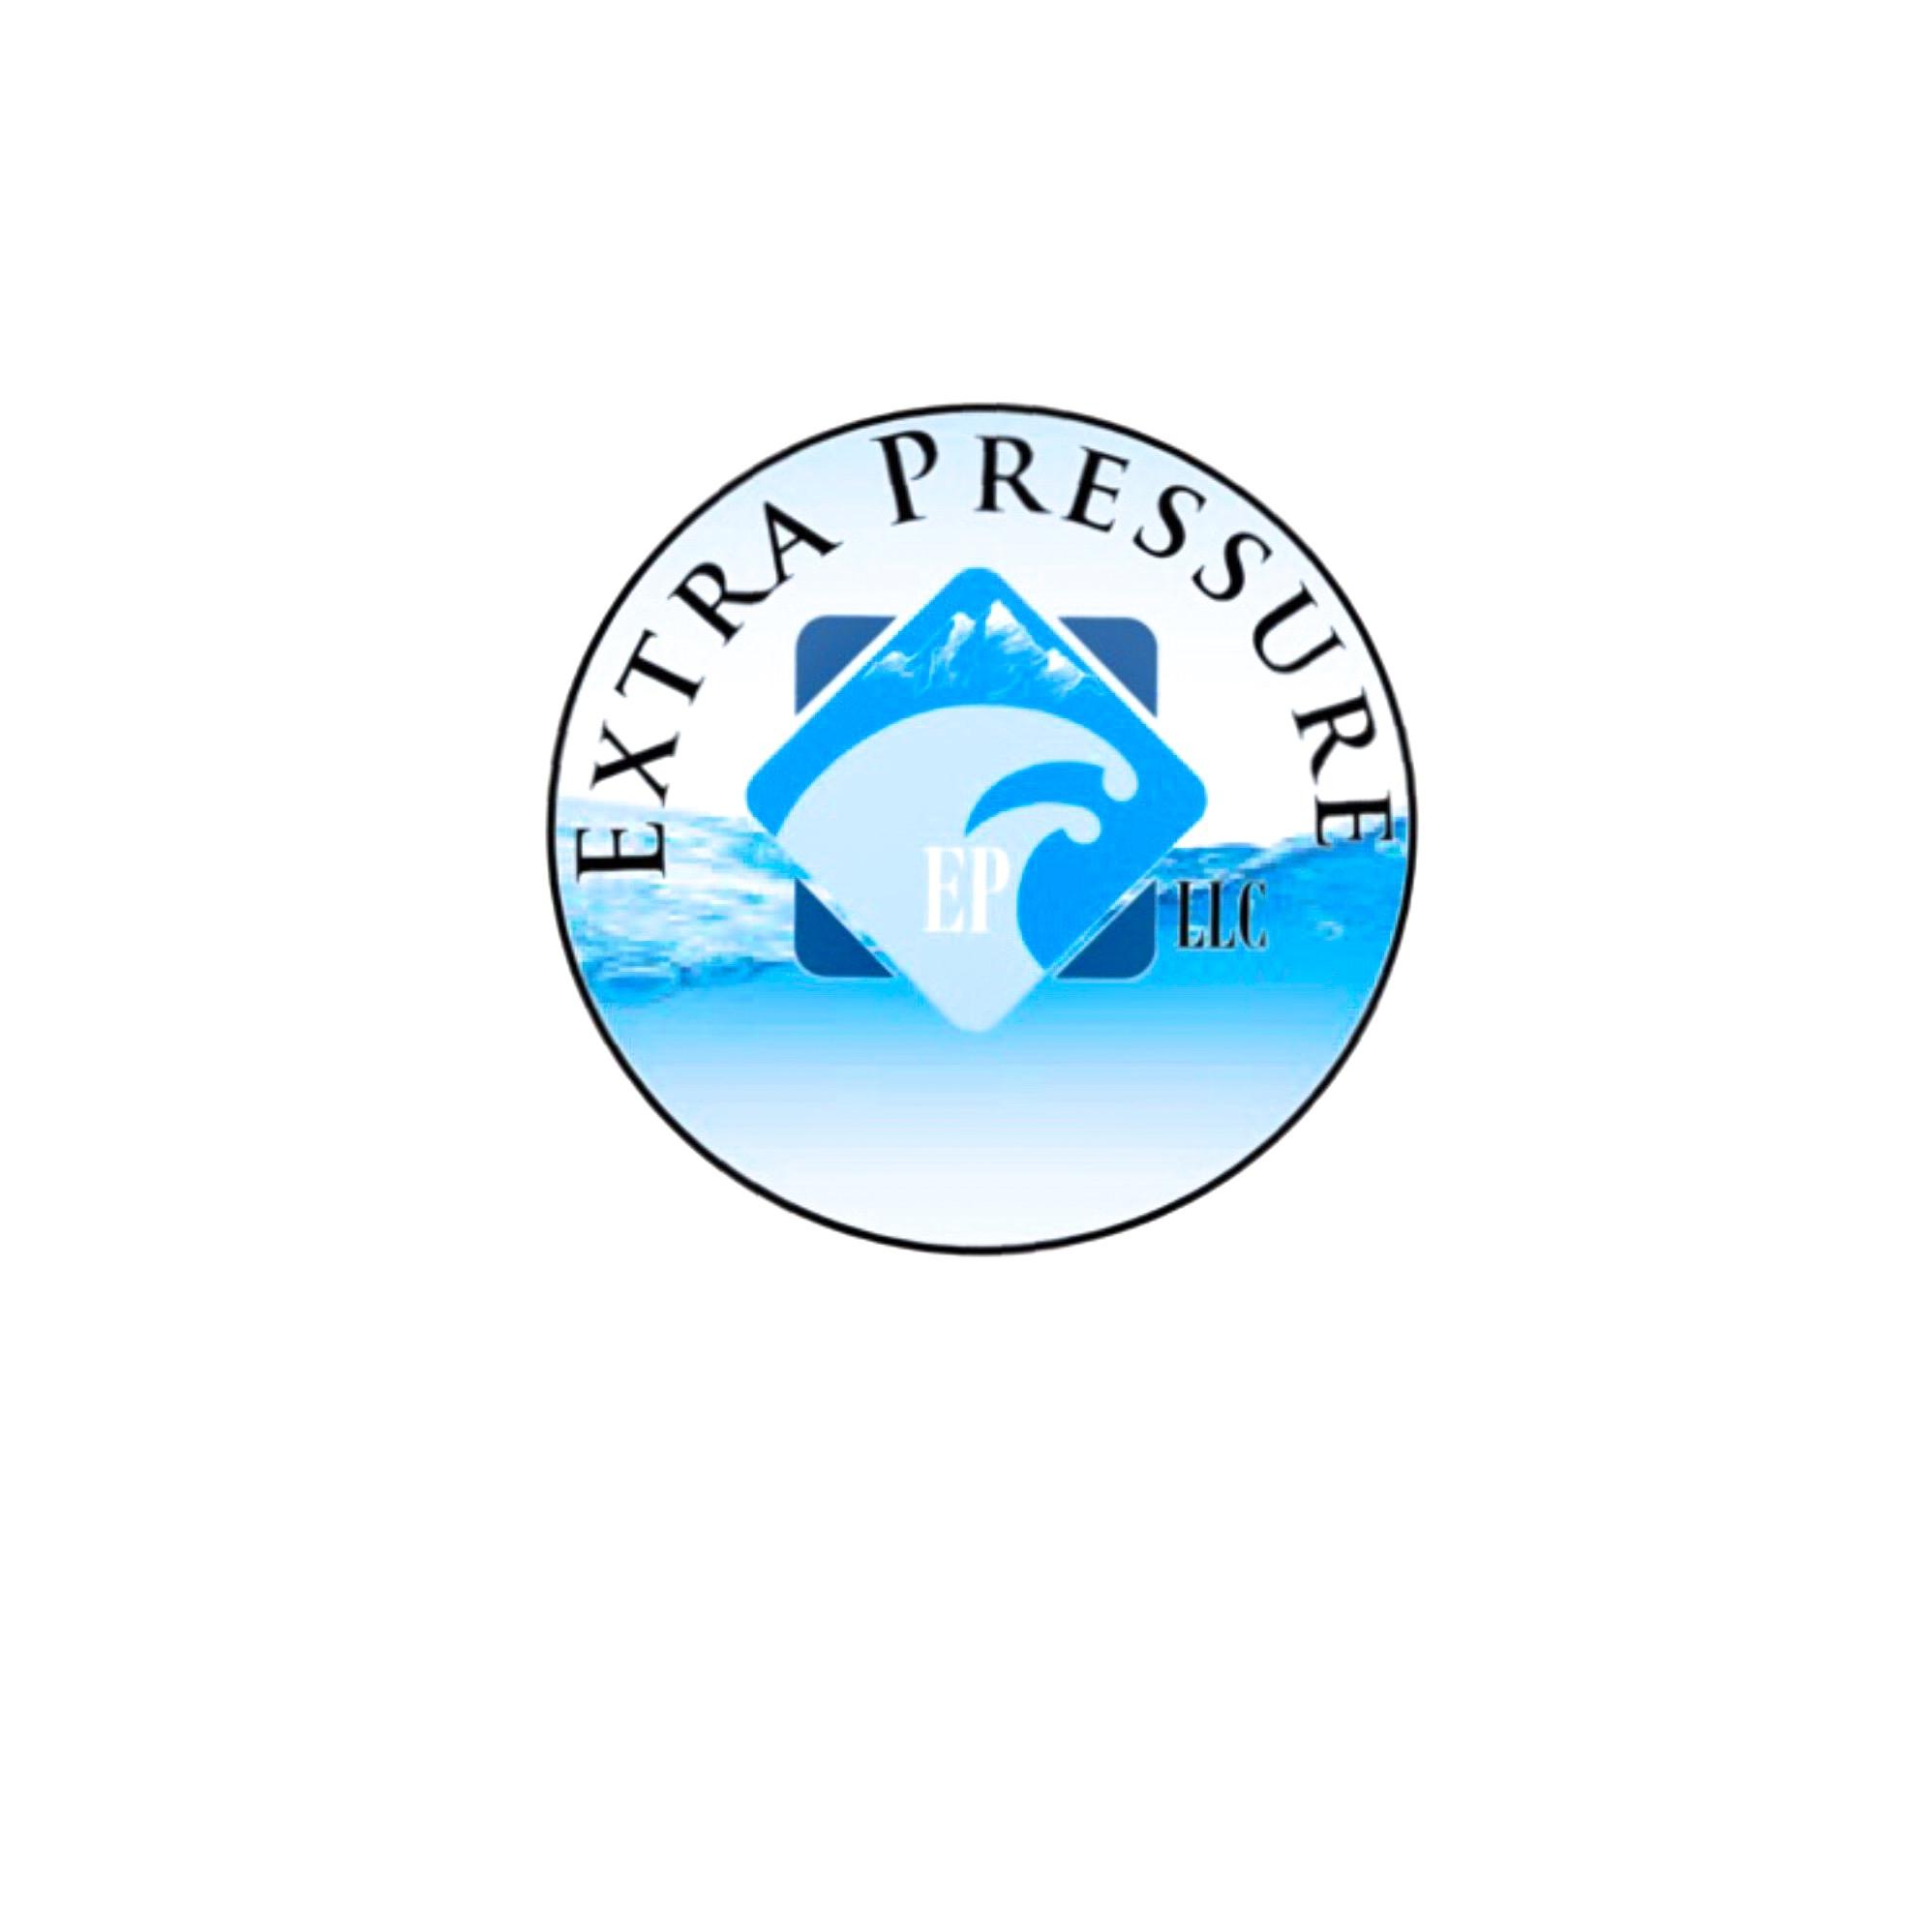 Extra Pressure LLC